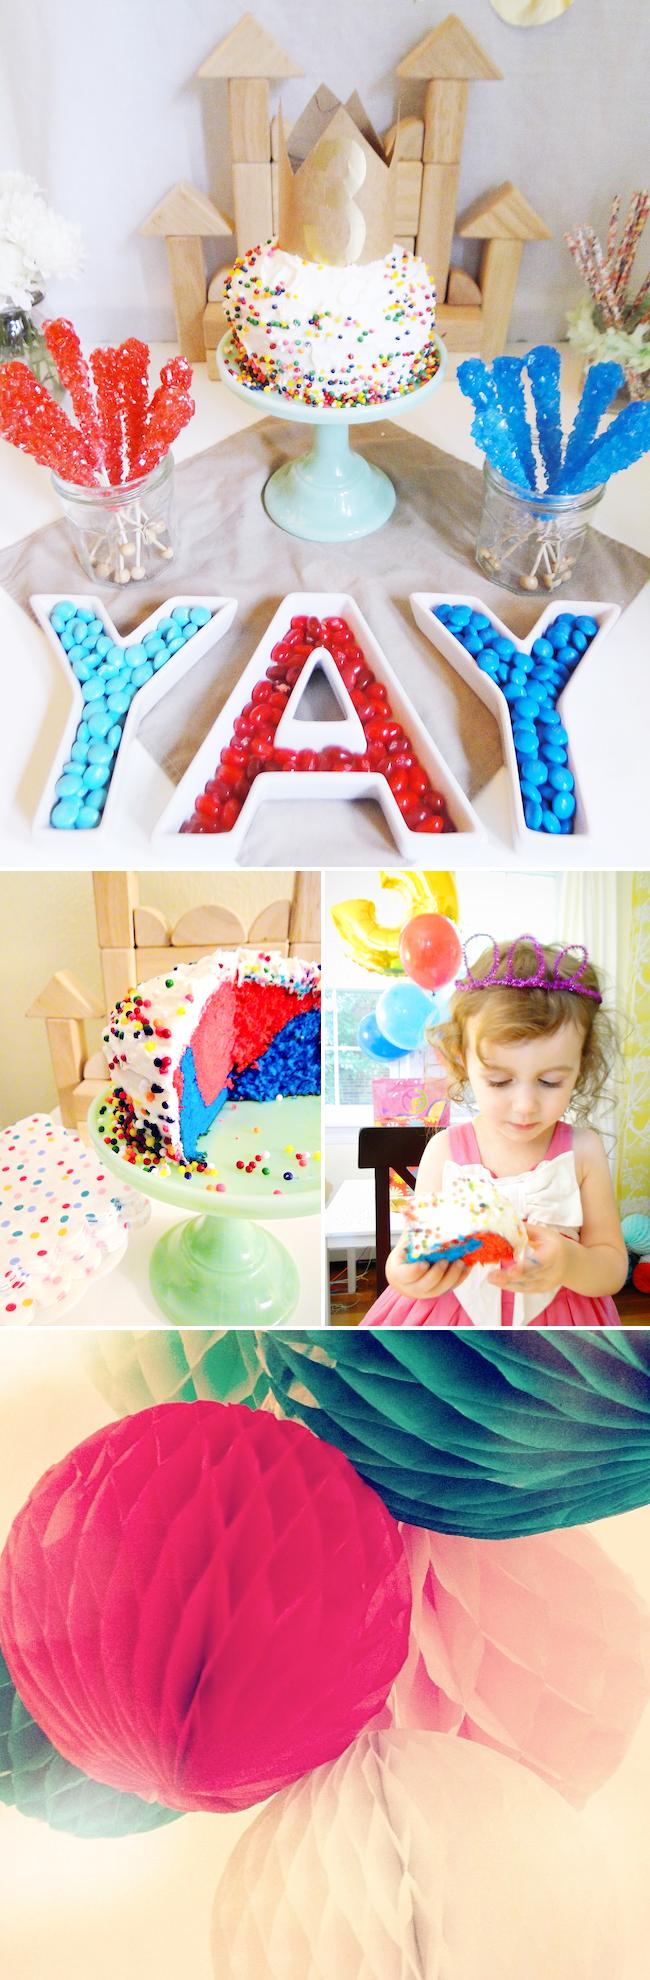 A-Lovely-Lark-Violets-3rd-Birthday